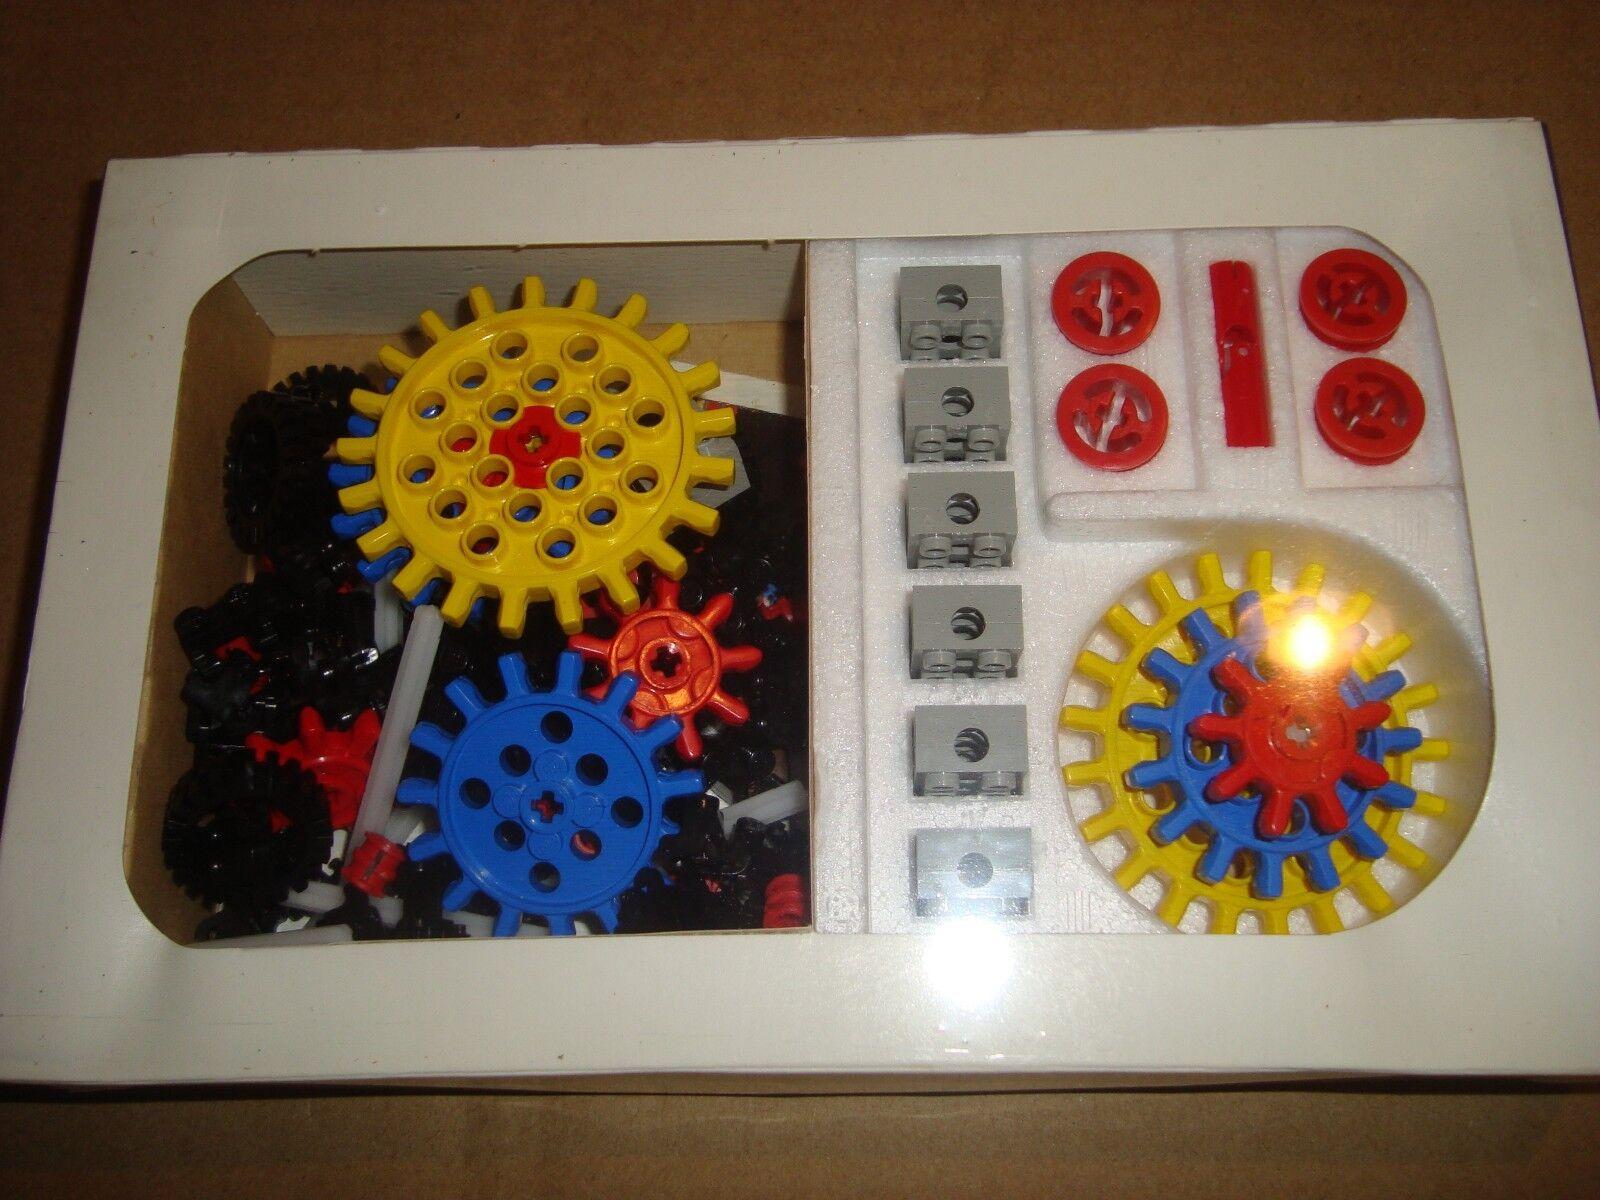 LEGO D 812-1 UNIVERSAL BUILDING BUILDING BUILDING SET GEARS LEGO 1974 59ed22